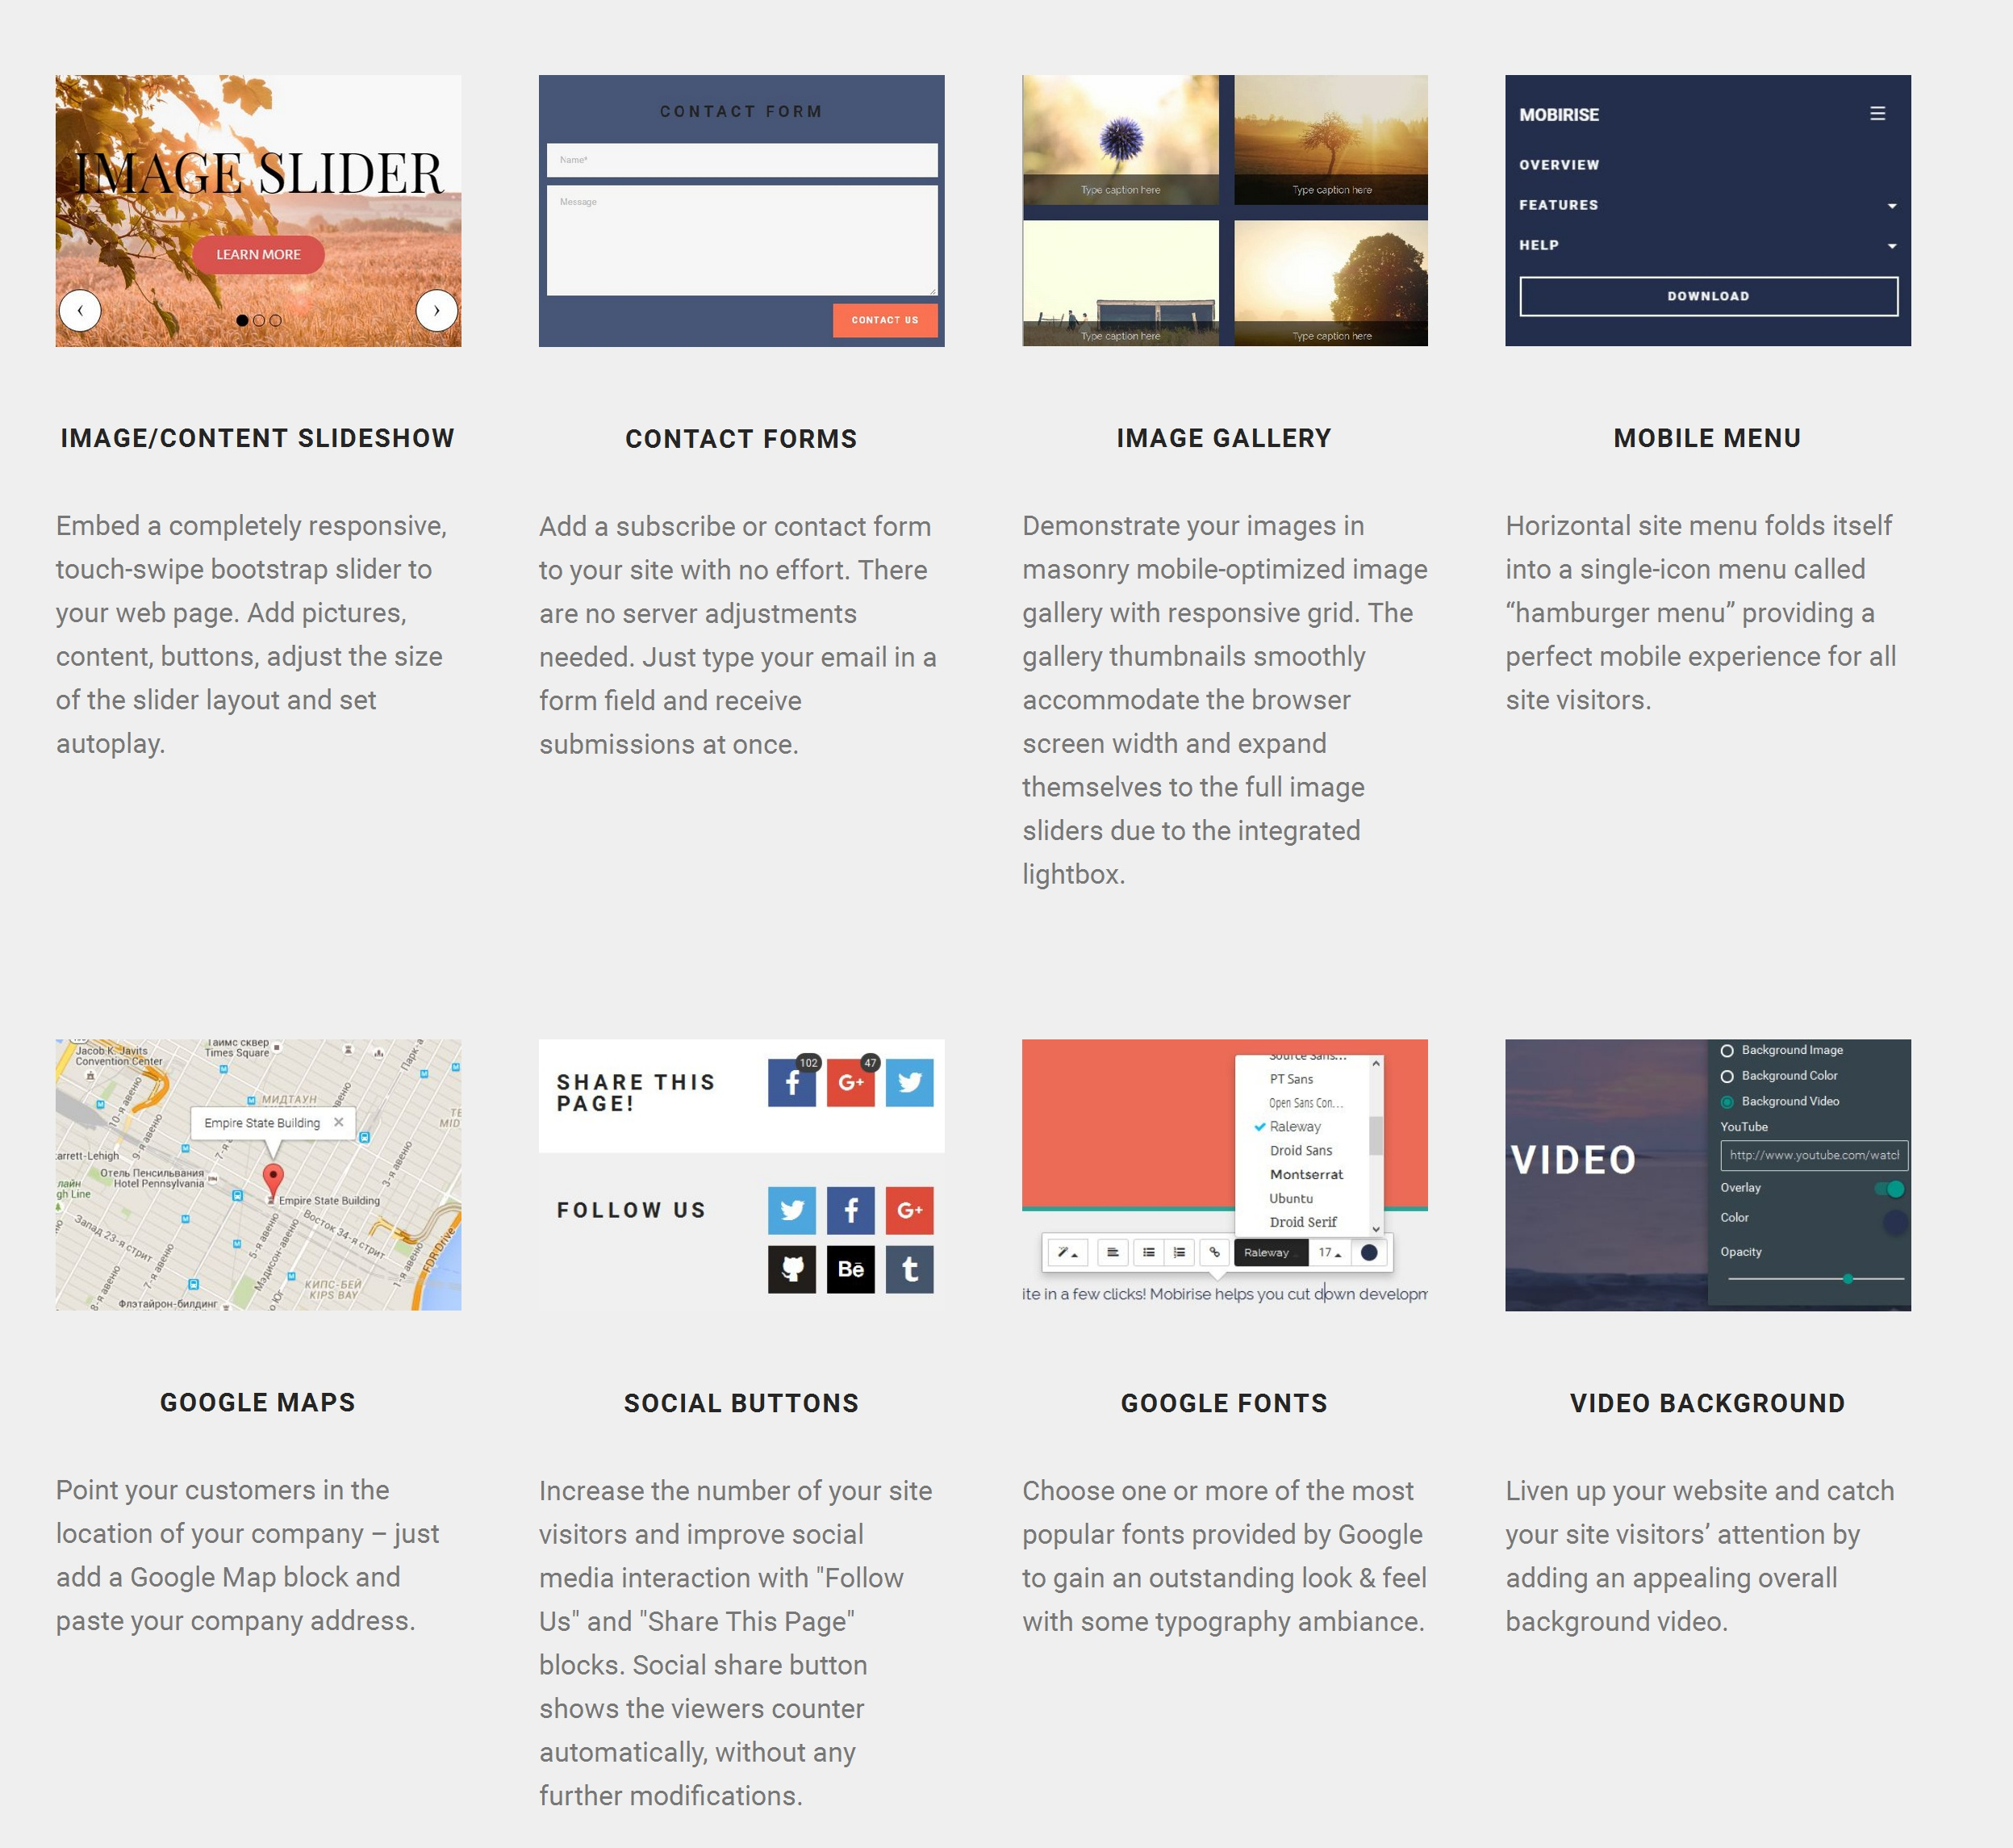 WYSIWYG Easy Website Builder Tool